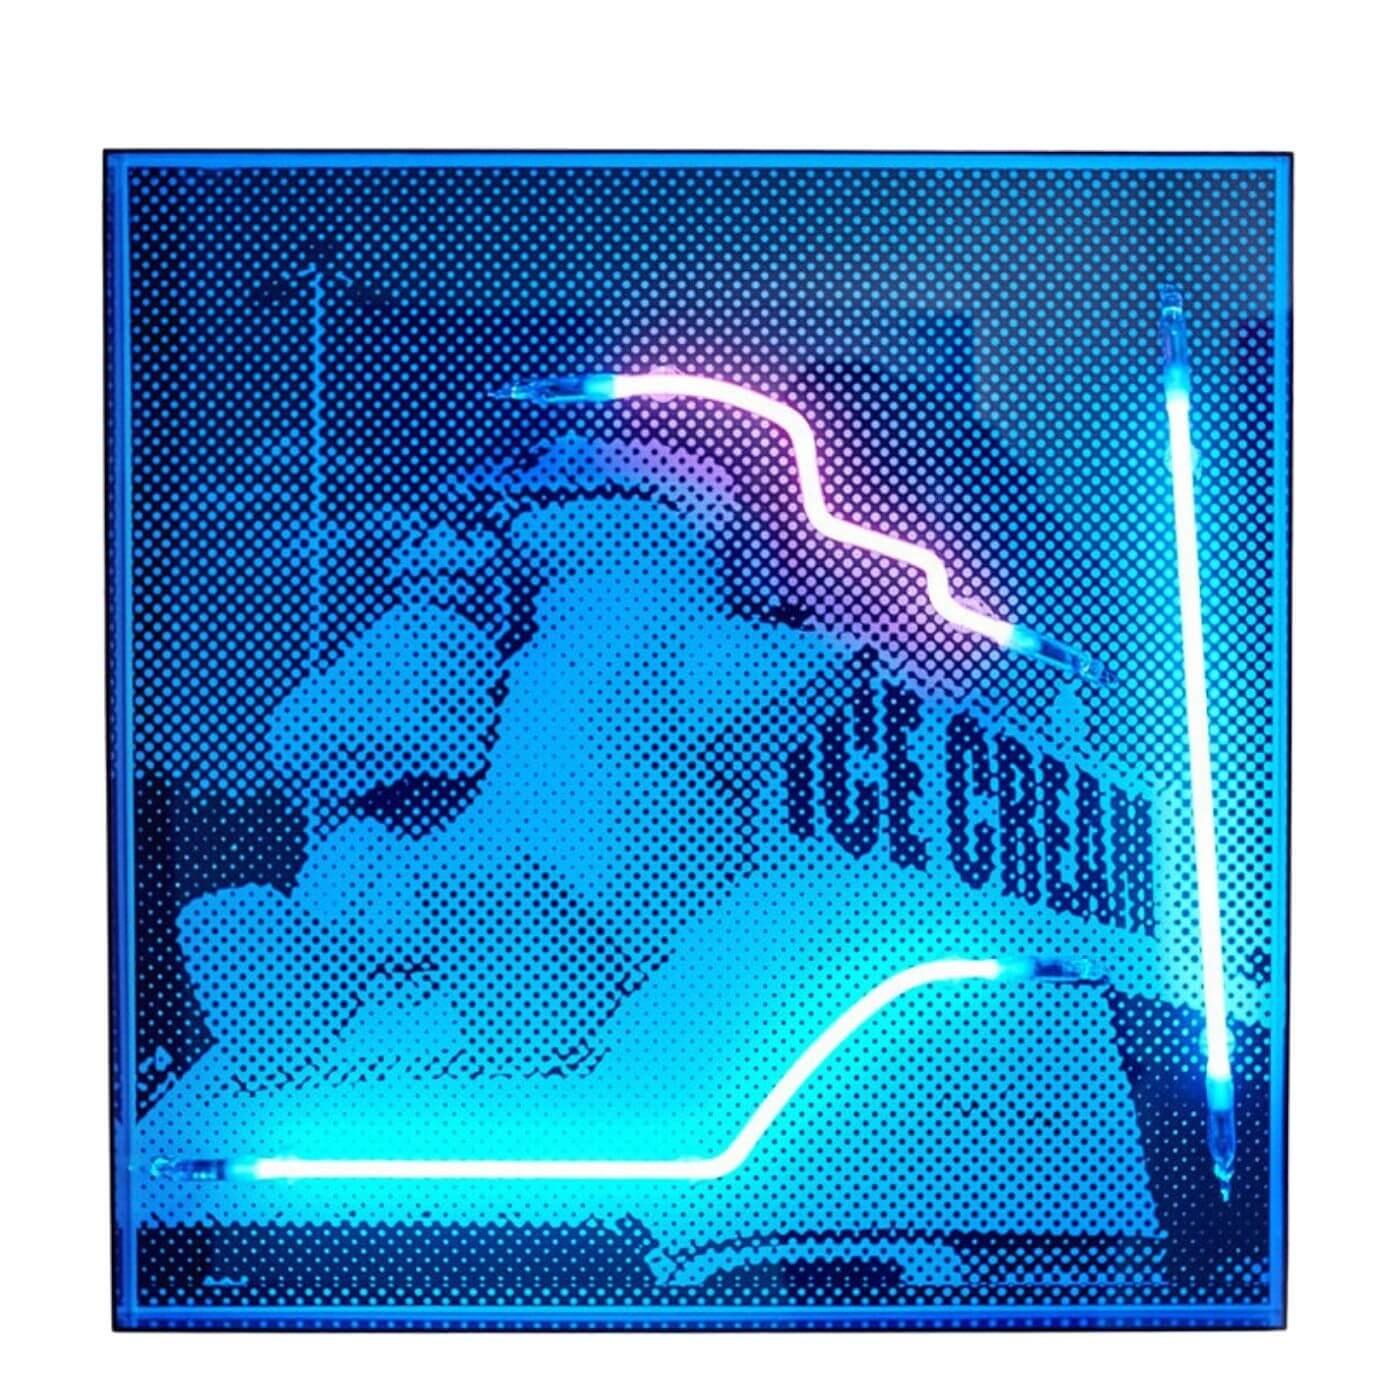 Tom Adair neon art work Polar Cones 2018